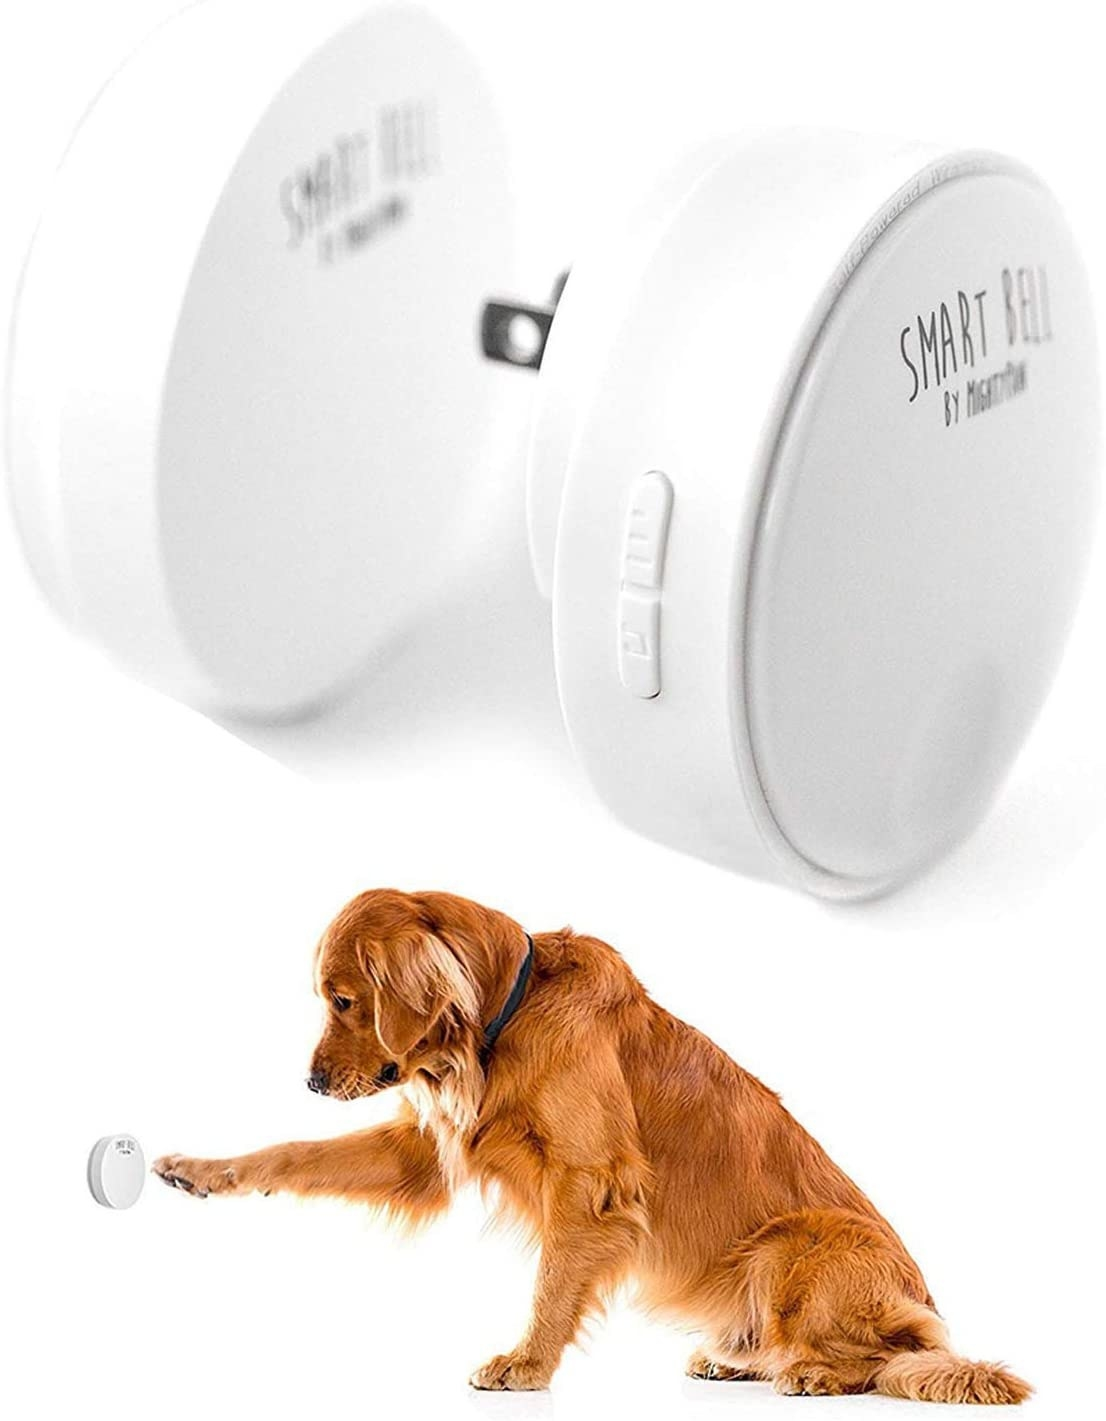 Dog pushingpaw against bell